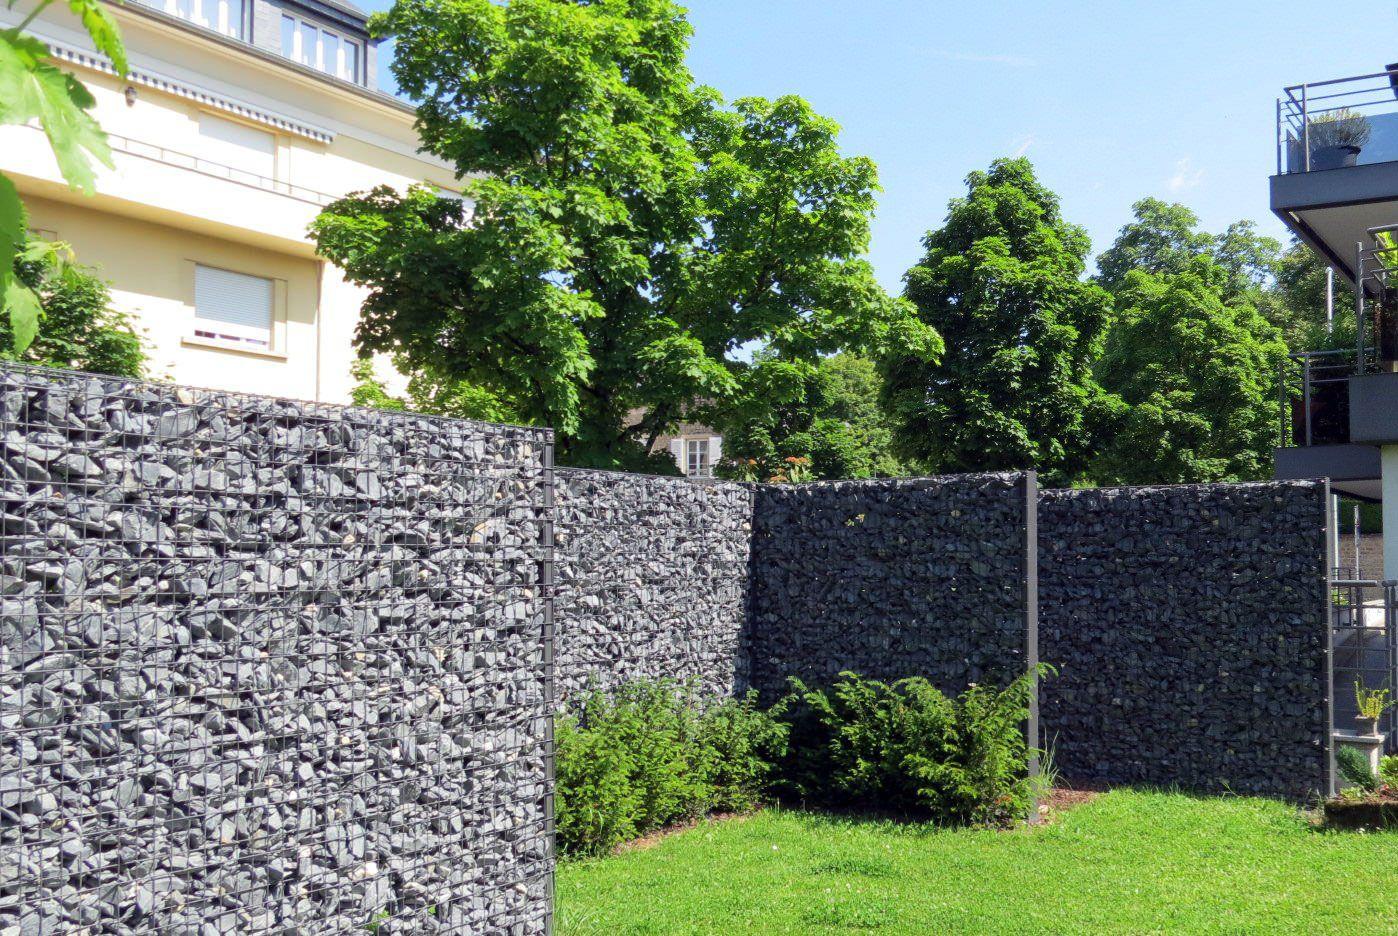 gabion cl ture palissade jardin et for t luxembourg pedra pinterest. Black Bedroom Furniture Sets. Home Design Ideas